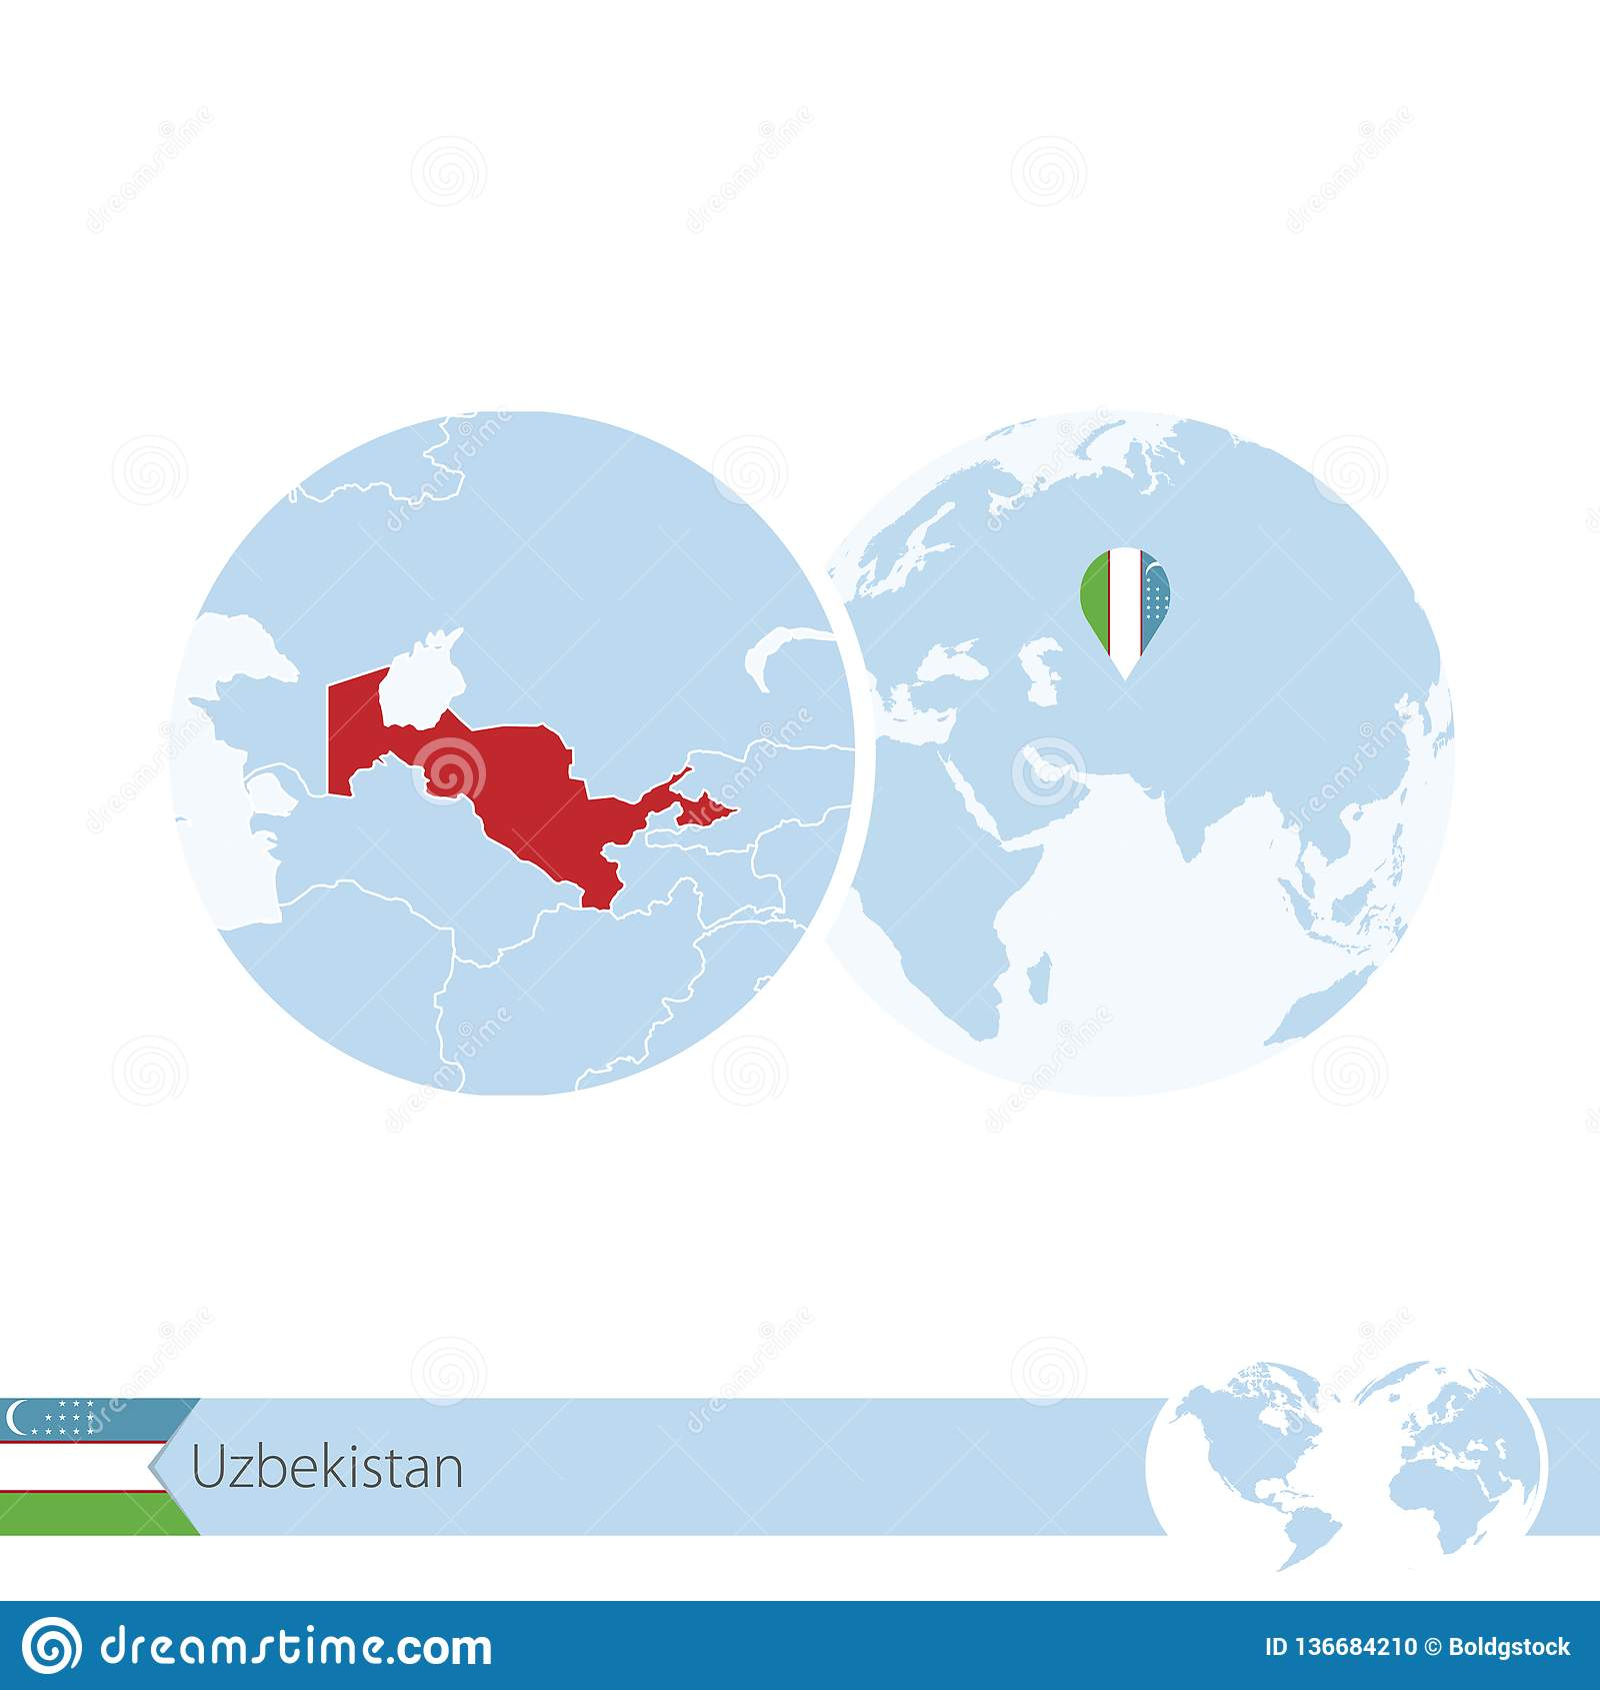 Uzbekistan On World Globe With Flag And Regional Map Of Uzbekistan Stock Vector Illustration Of Asian Icon 136684210